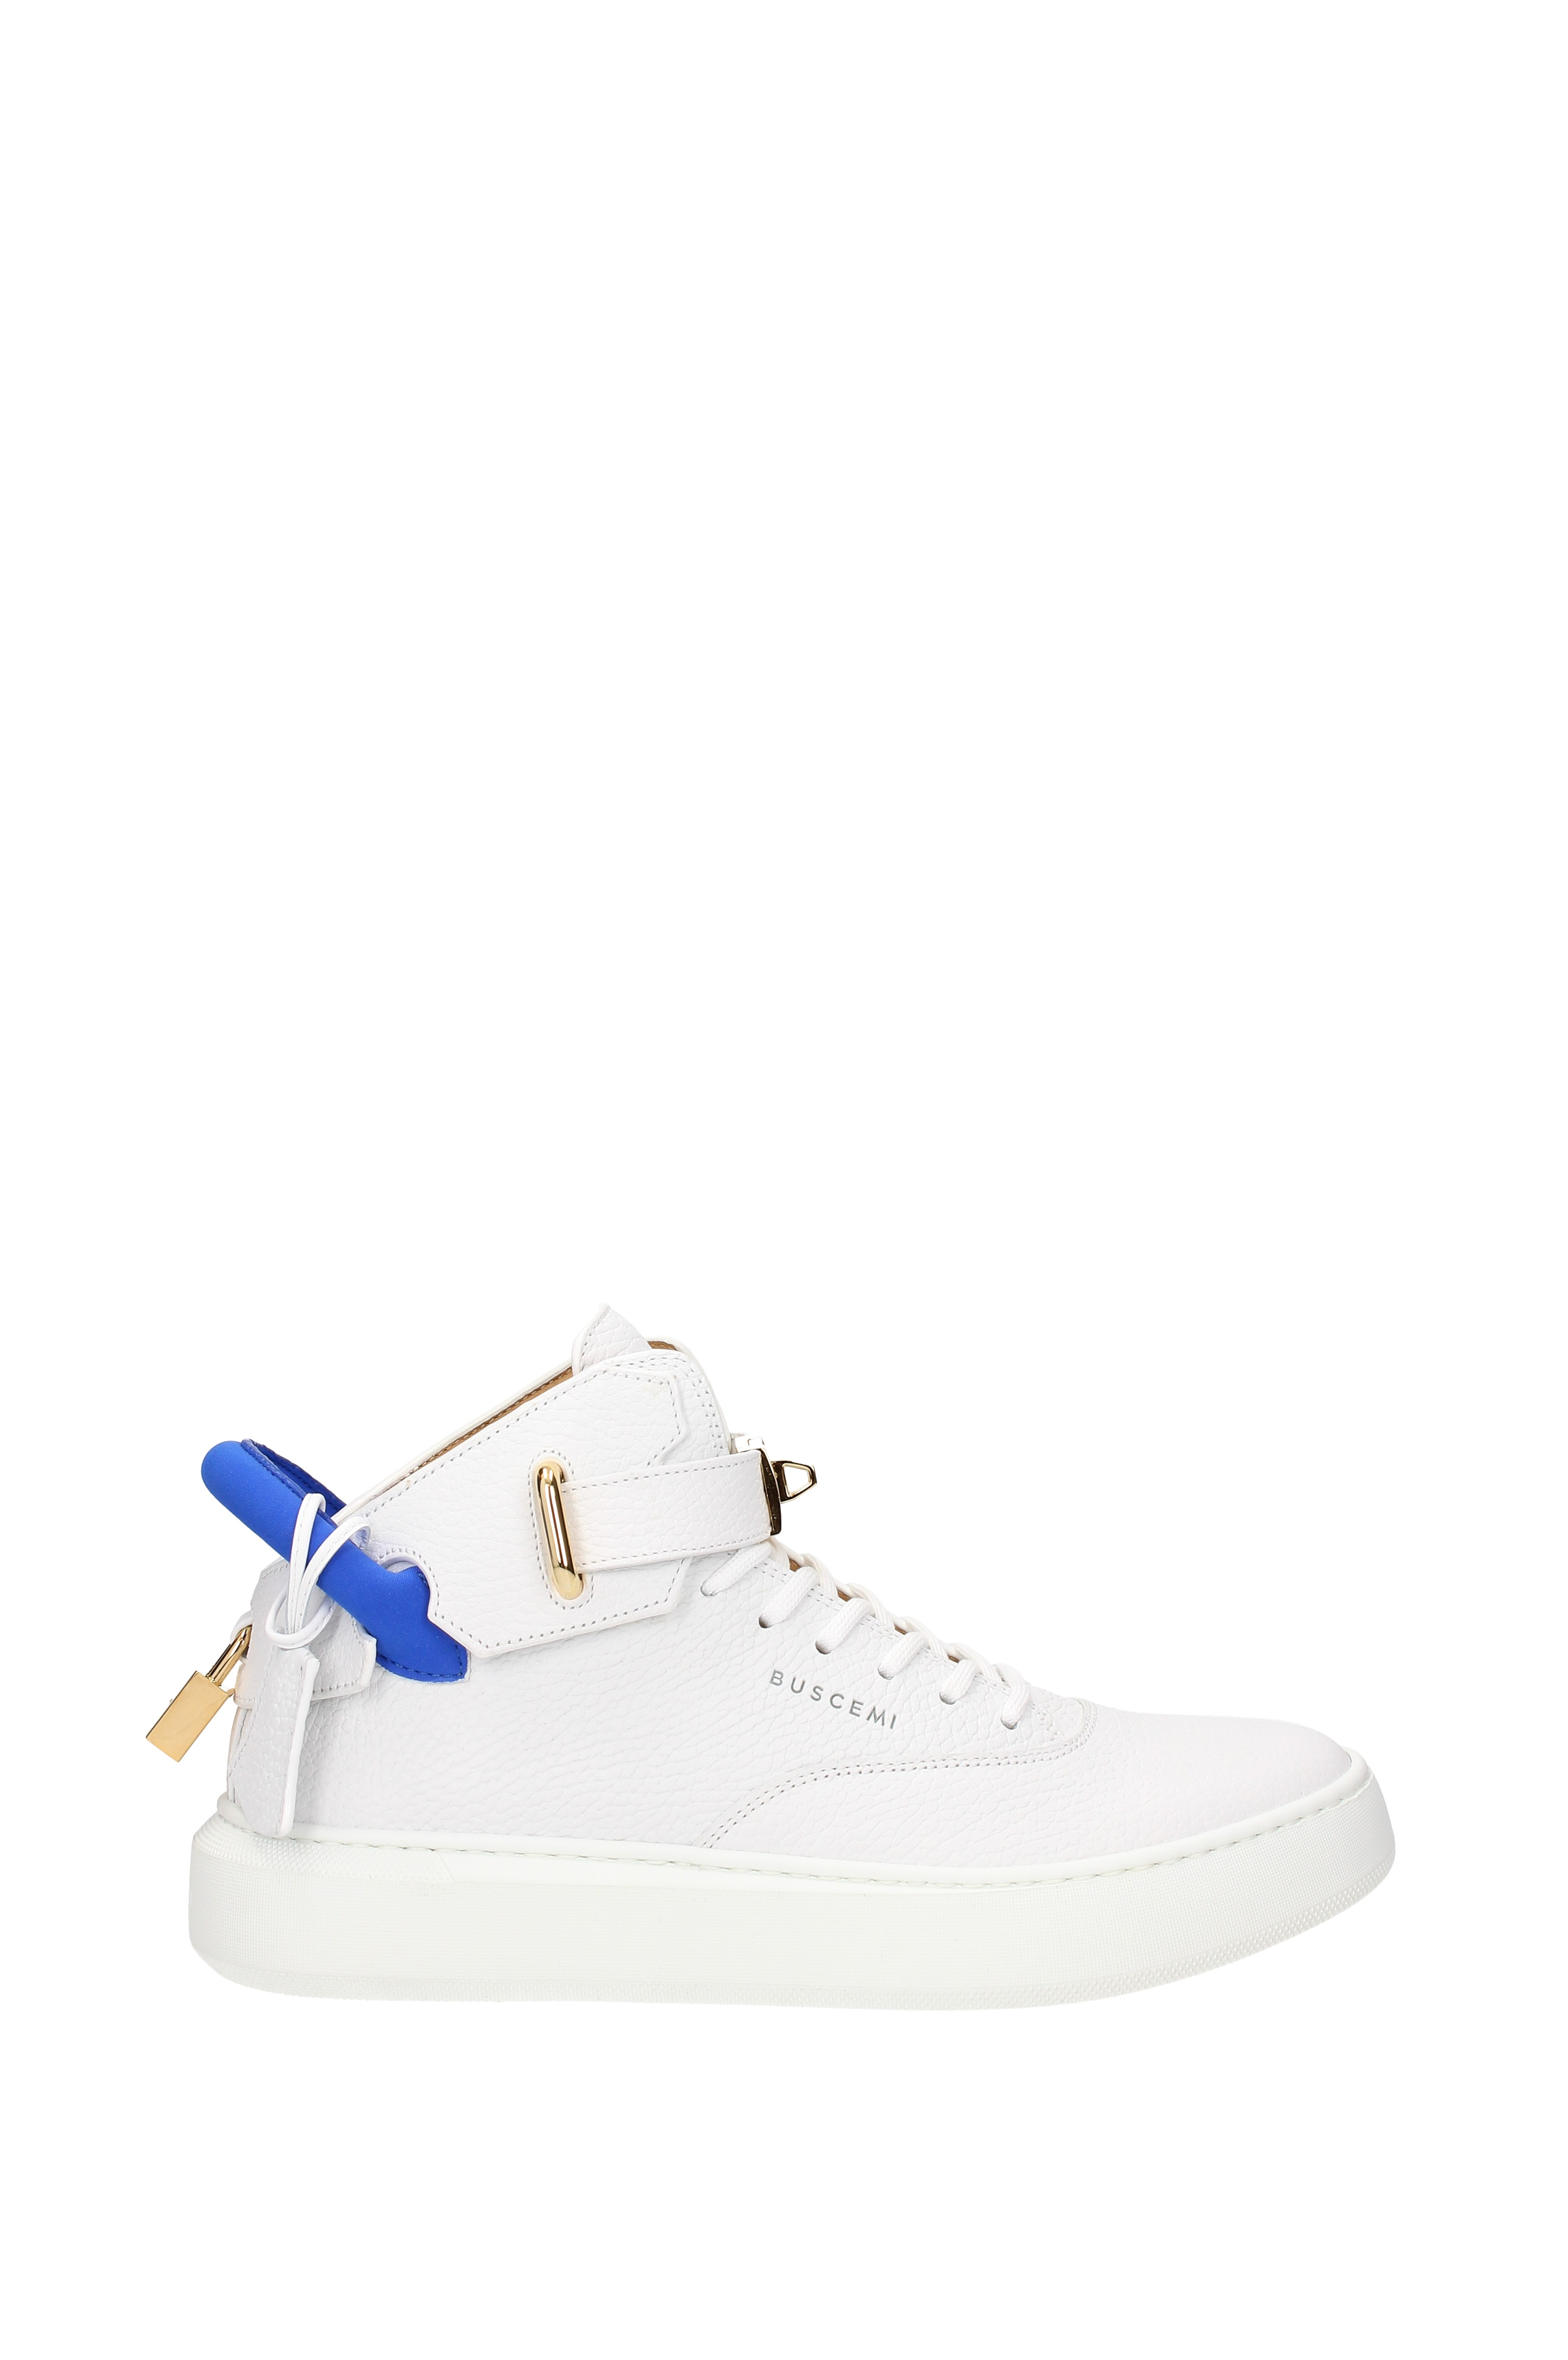 Sneakers Buscemi 100 mm Leder mid alce Herren - Leder mm (10MLC) ef6d81